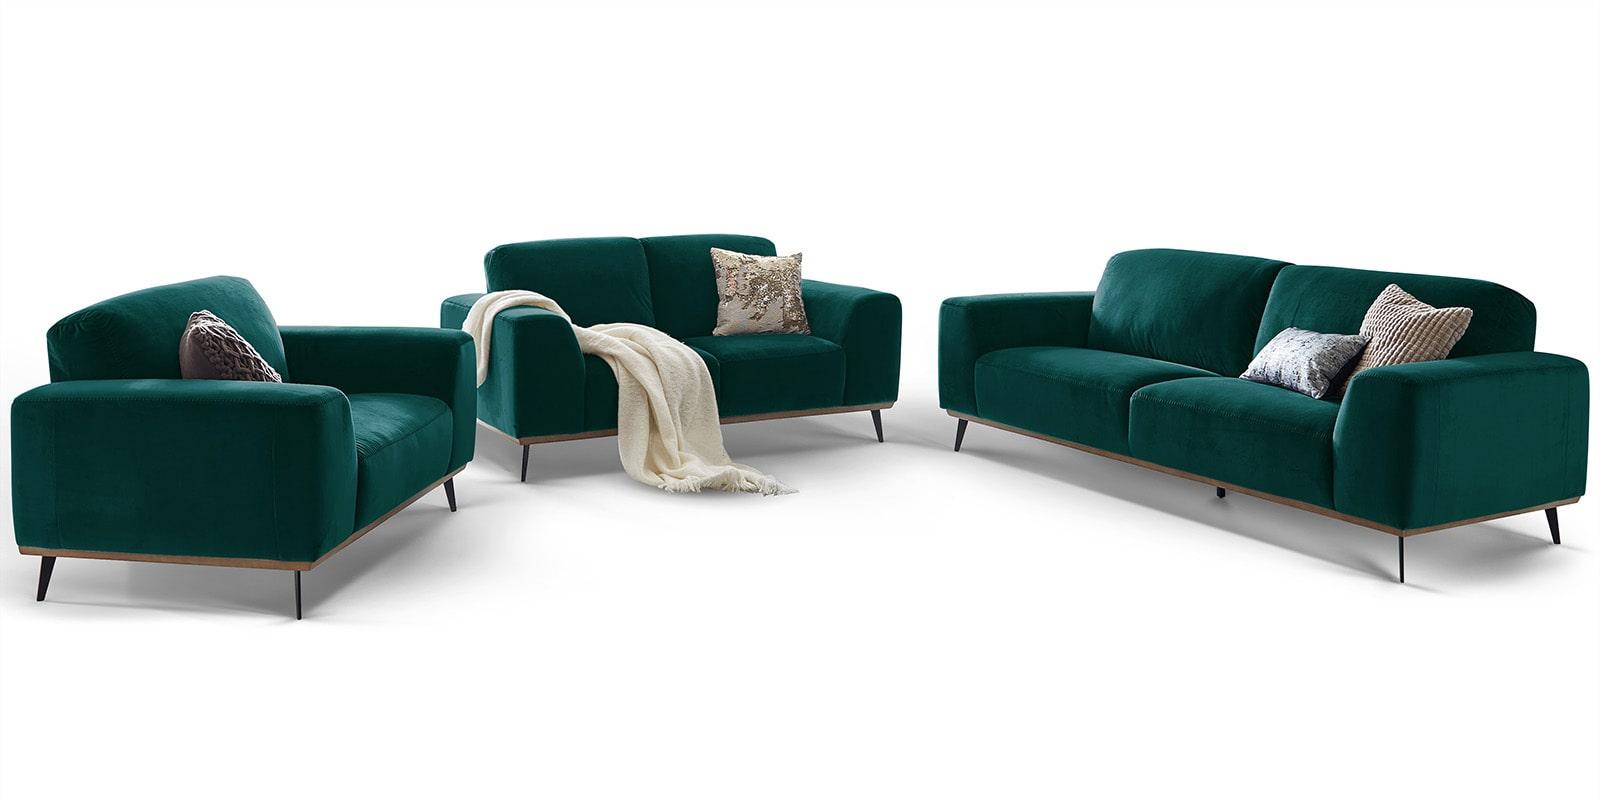 Moebella24 - 3-2-1-Sitzer - Sofa - Barcelona - Samt - Petrol - Skandinavisches - Design - Punto - cavallo - Nähte